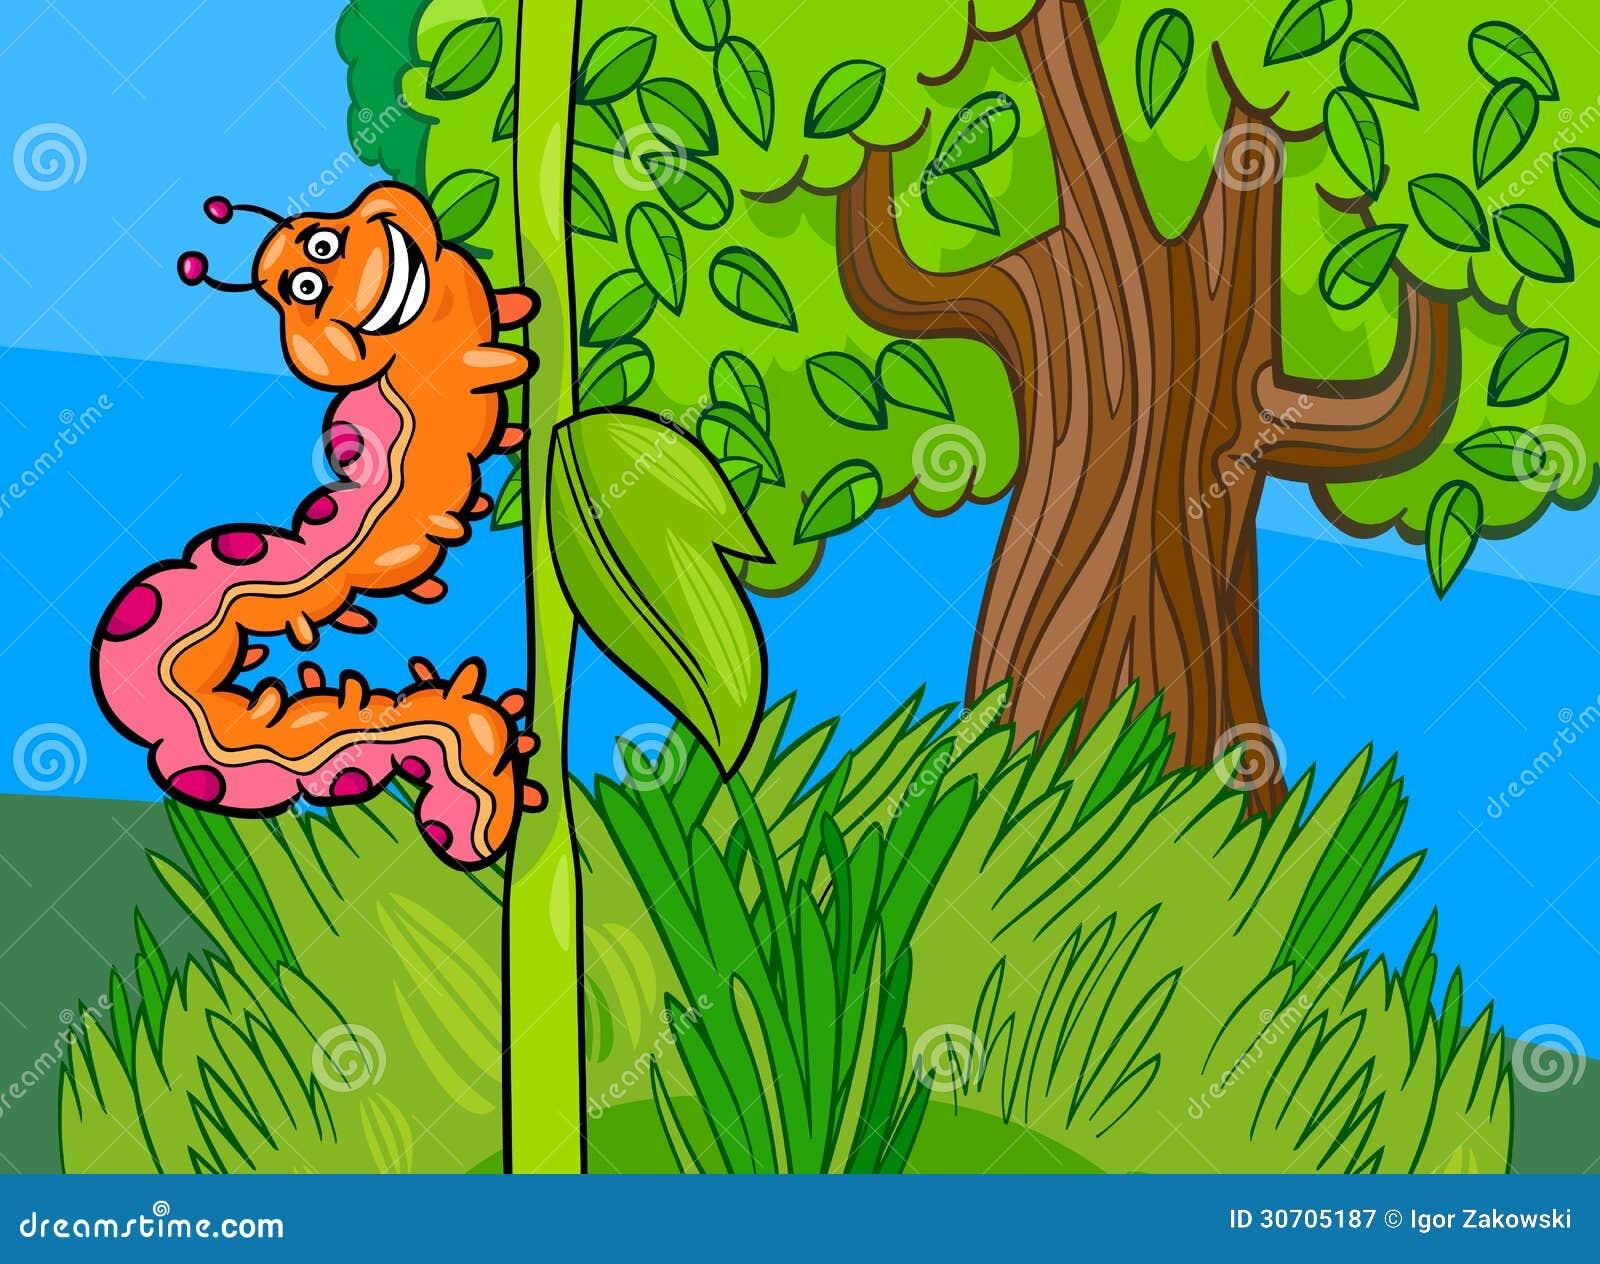 Caterpillar Insect Cartoon Illustration Royalty Free Stock